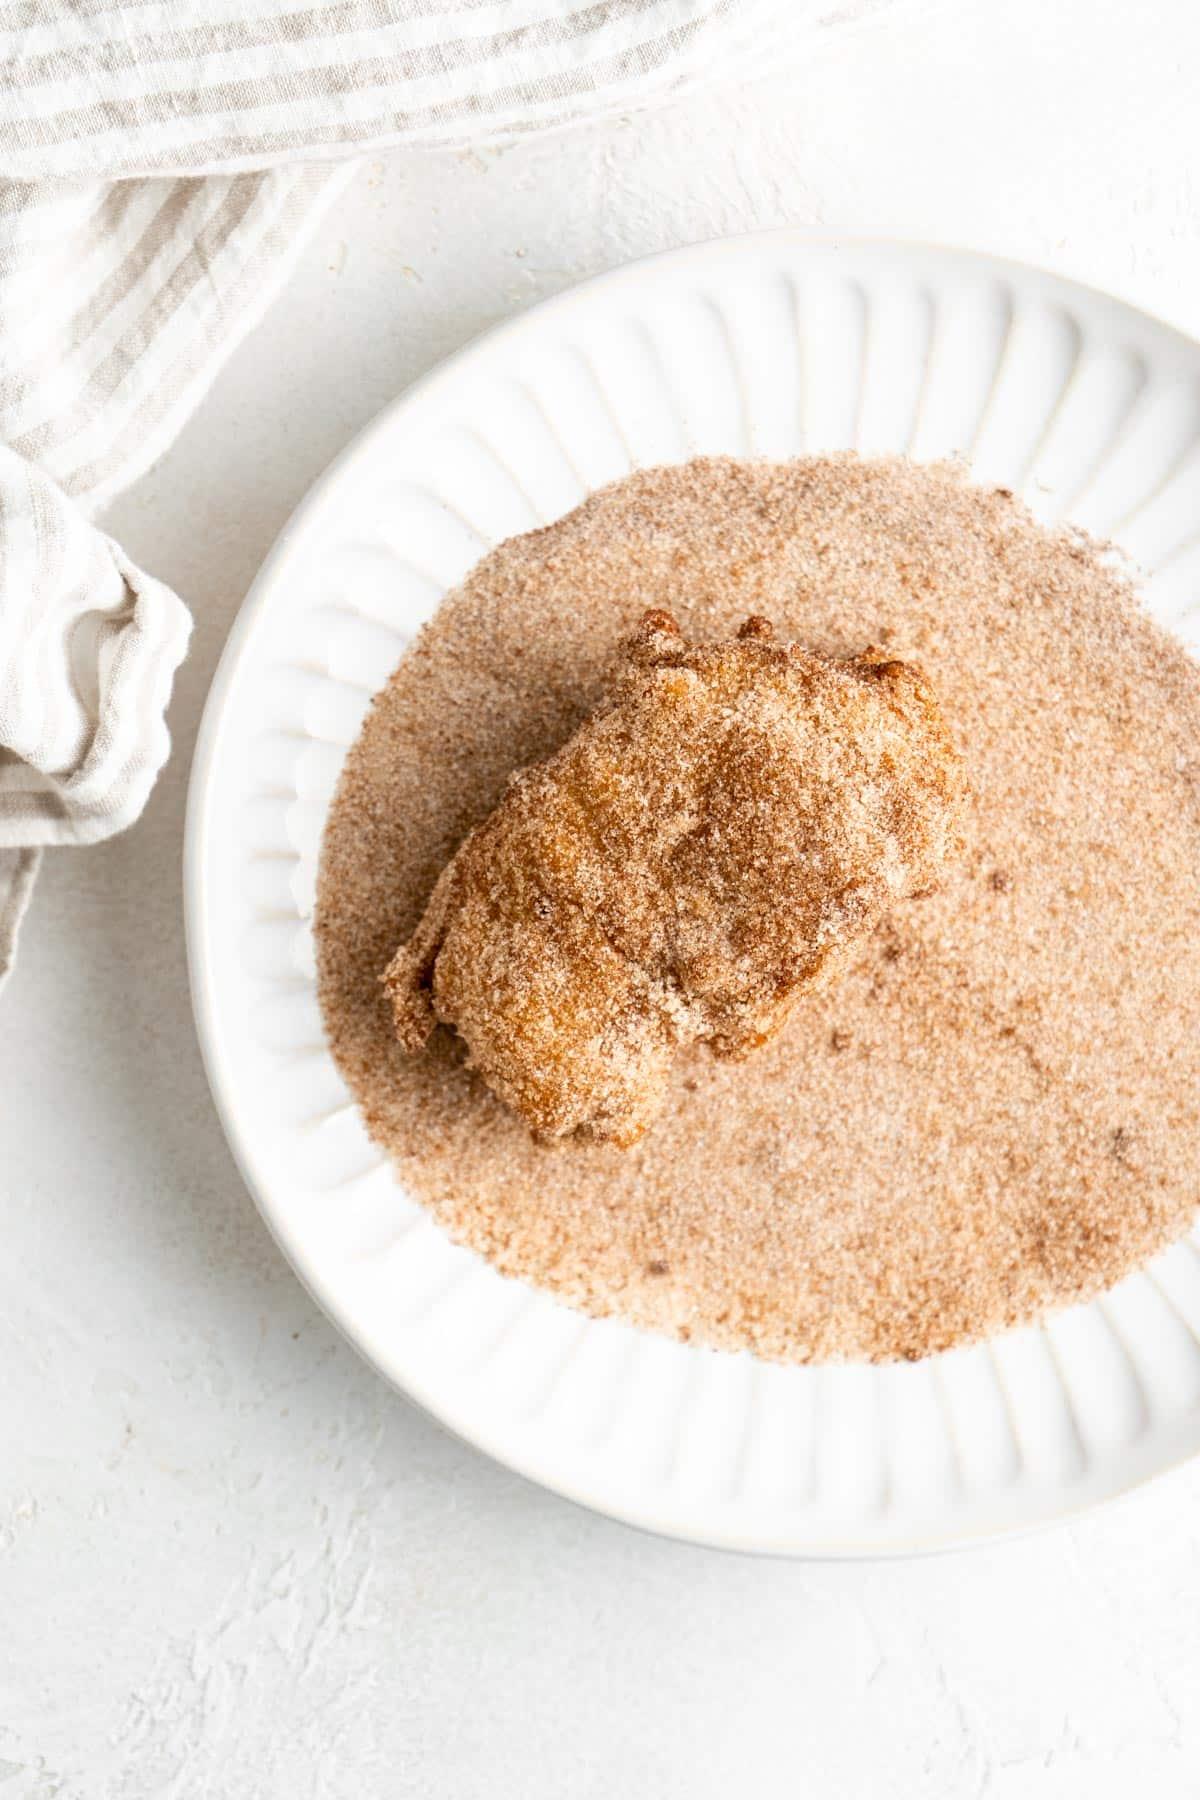 rolling apple fritters in cinnamon & sugar mixture